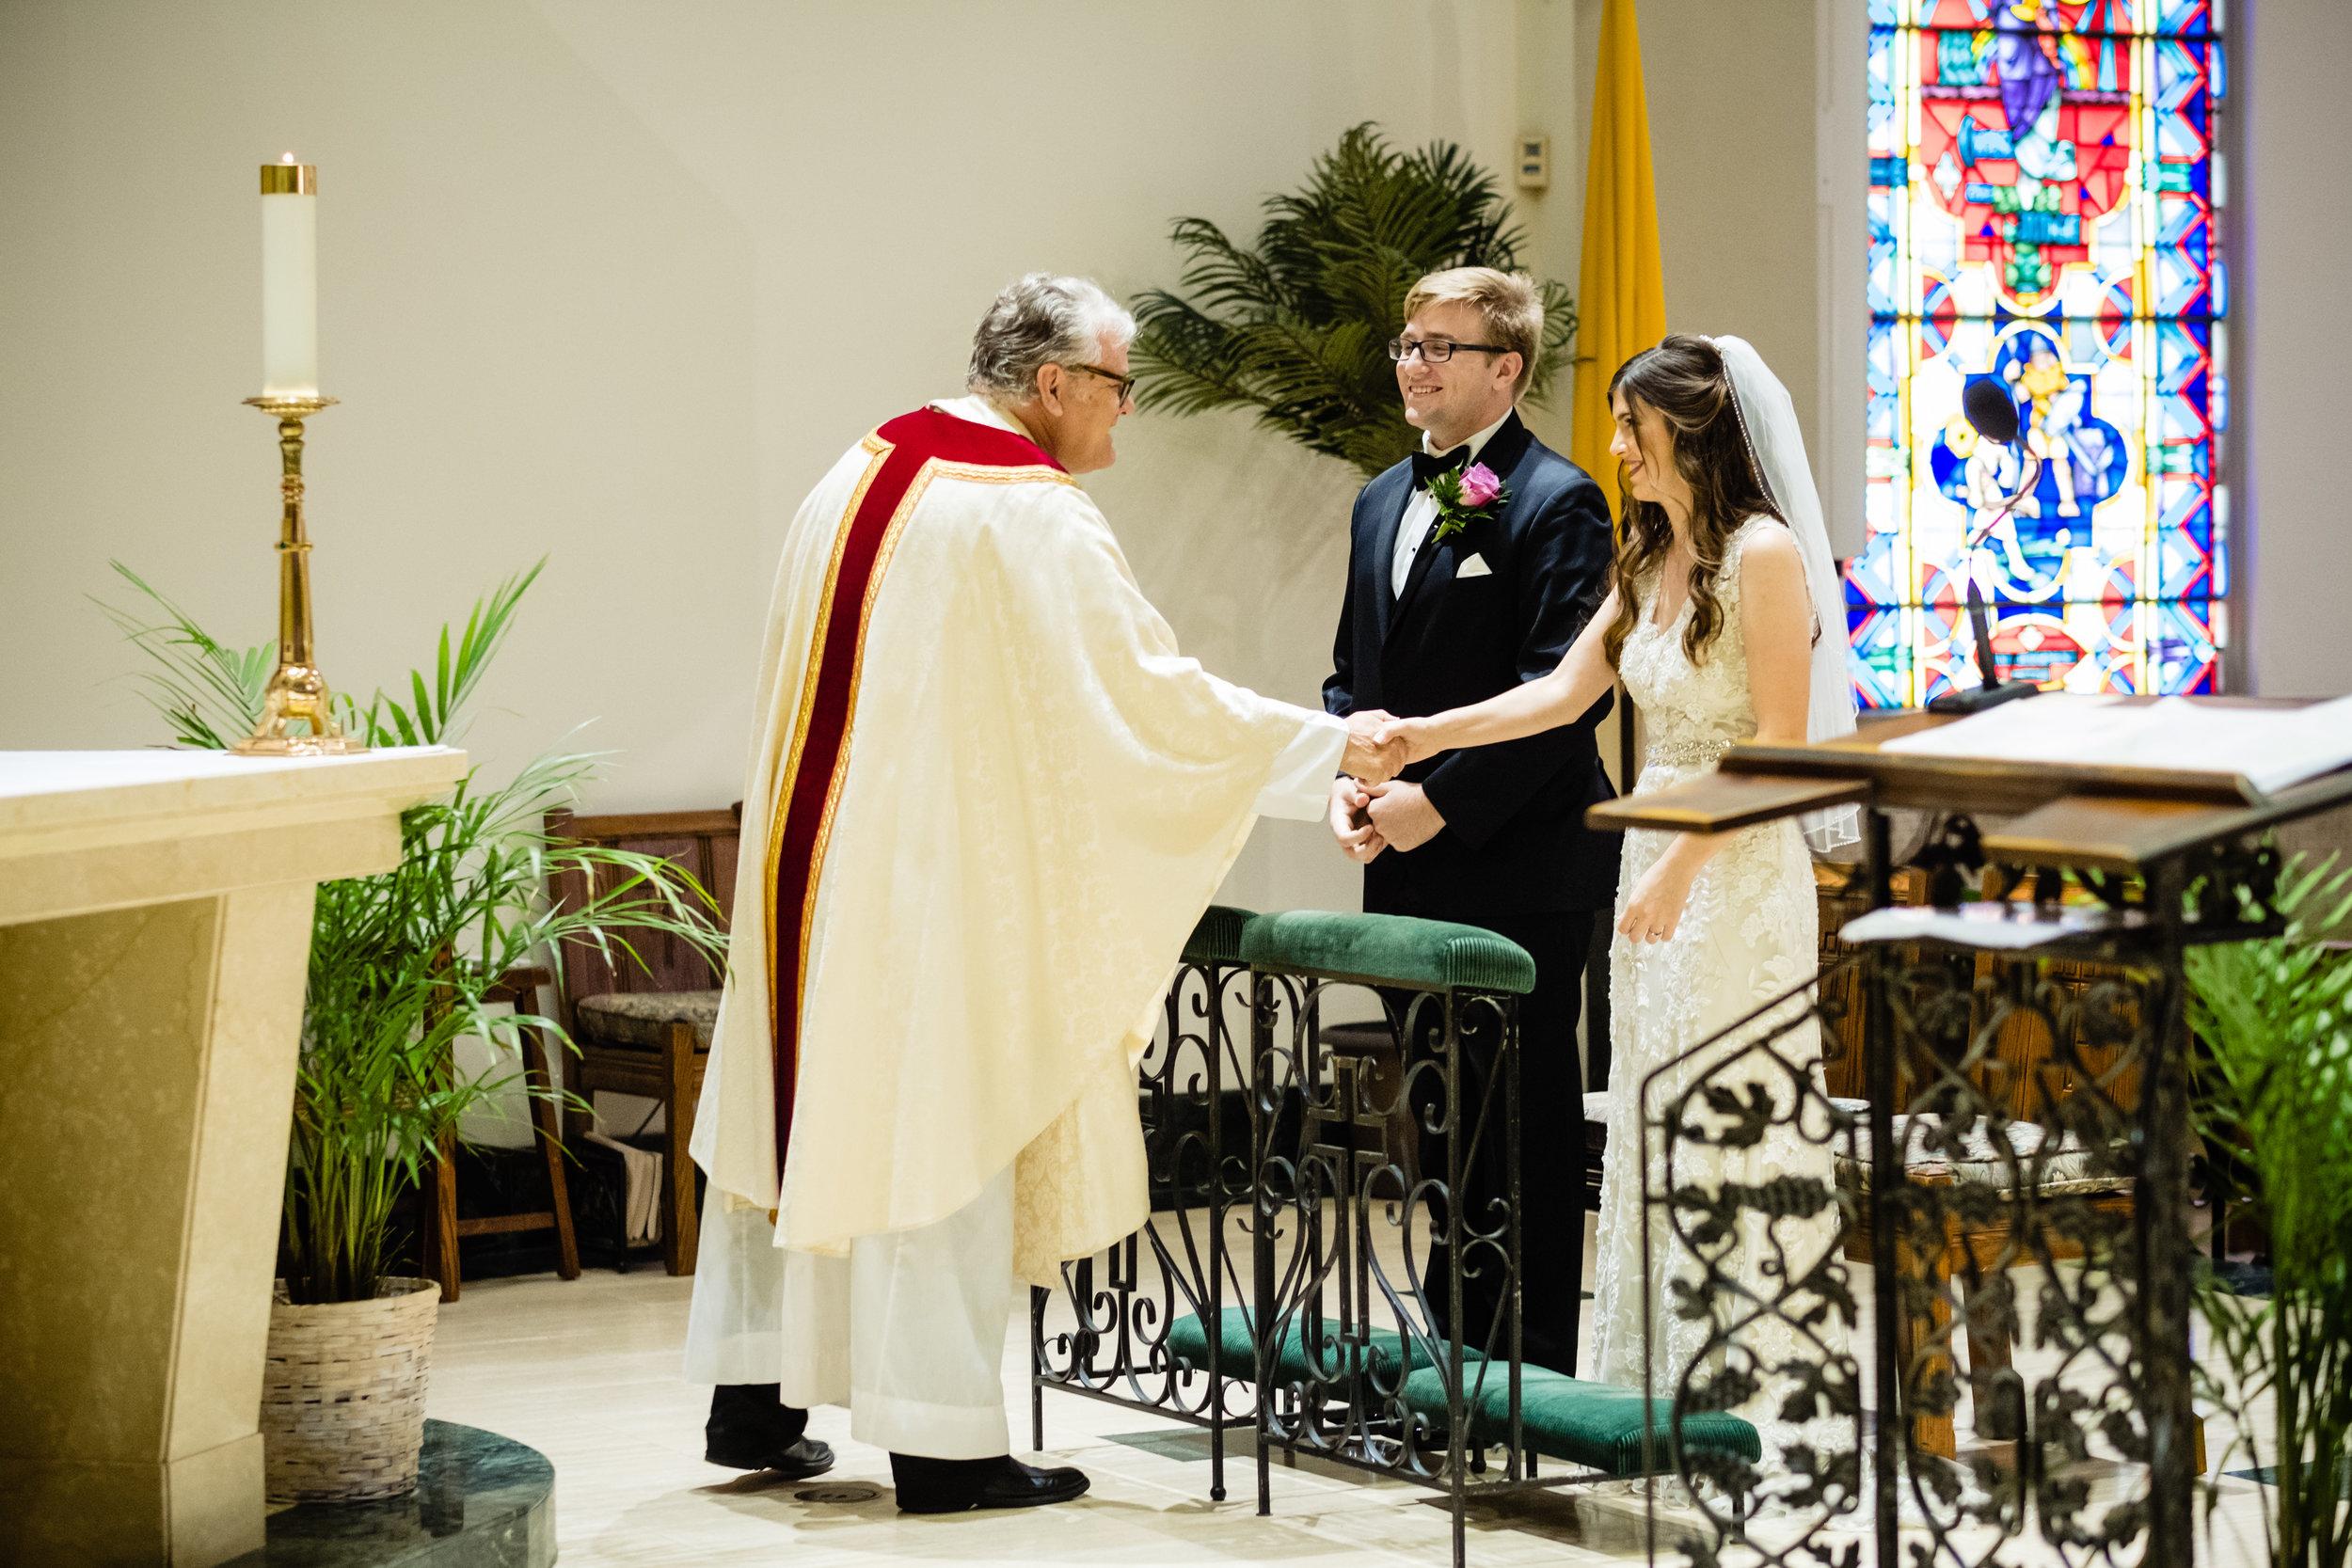 HAH_Zoe and Daniel_Clearwater Wedding_148_2018.jpg